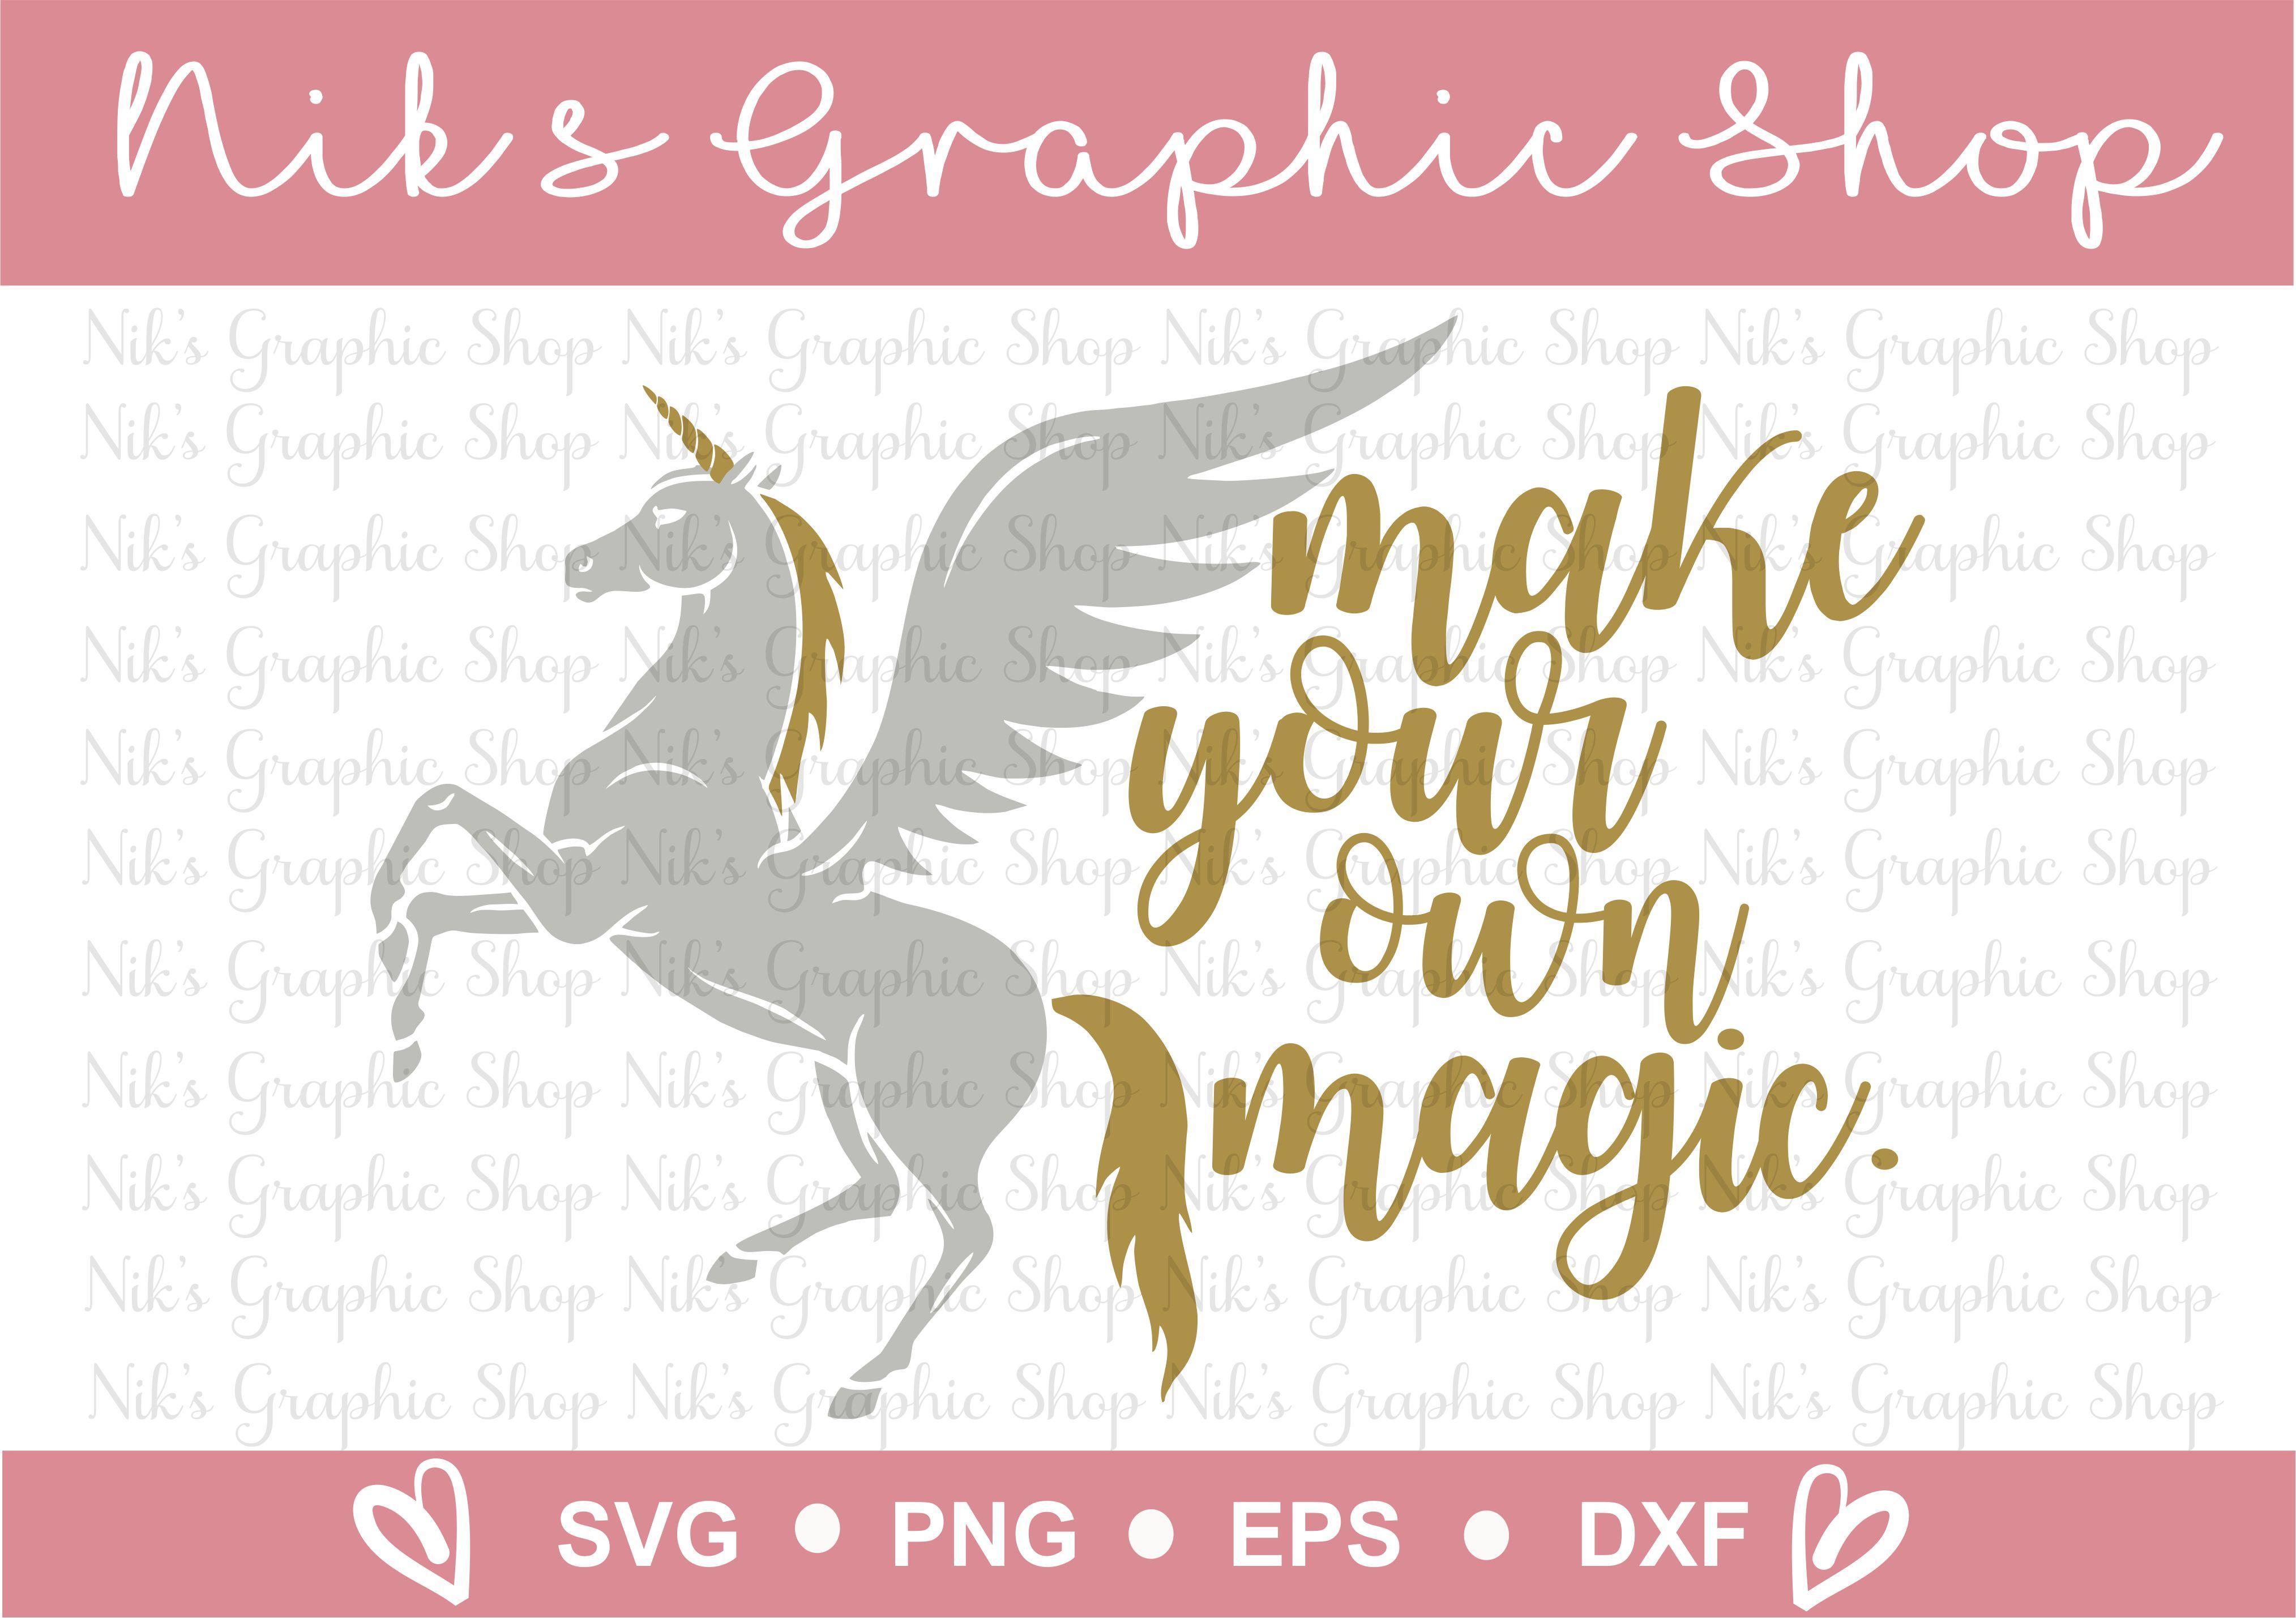 Unicorn Svg, Magic Svg, Make your own Magic Svg, Cut Files example image 2